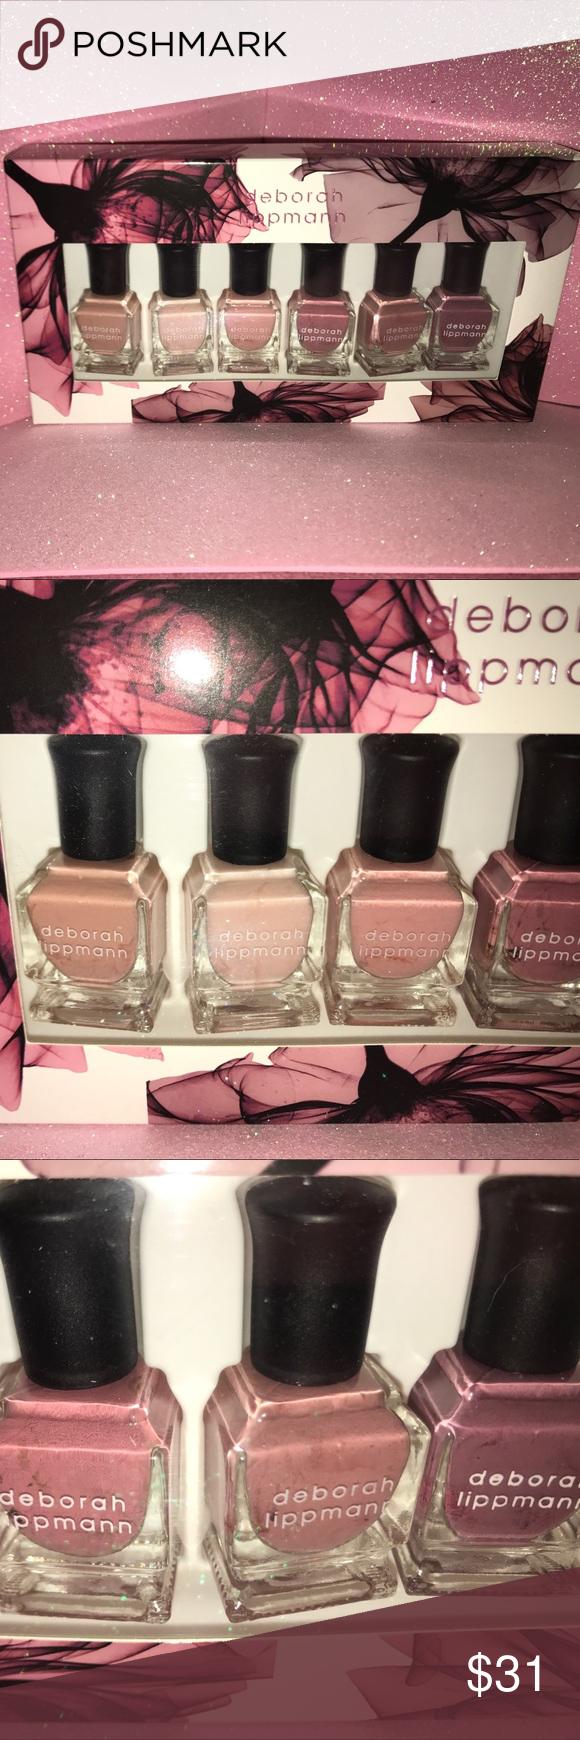 Deborah Lippmann Bed of Roses Nail Polish Set | Neutral nail polish ...